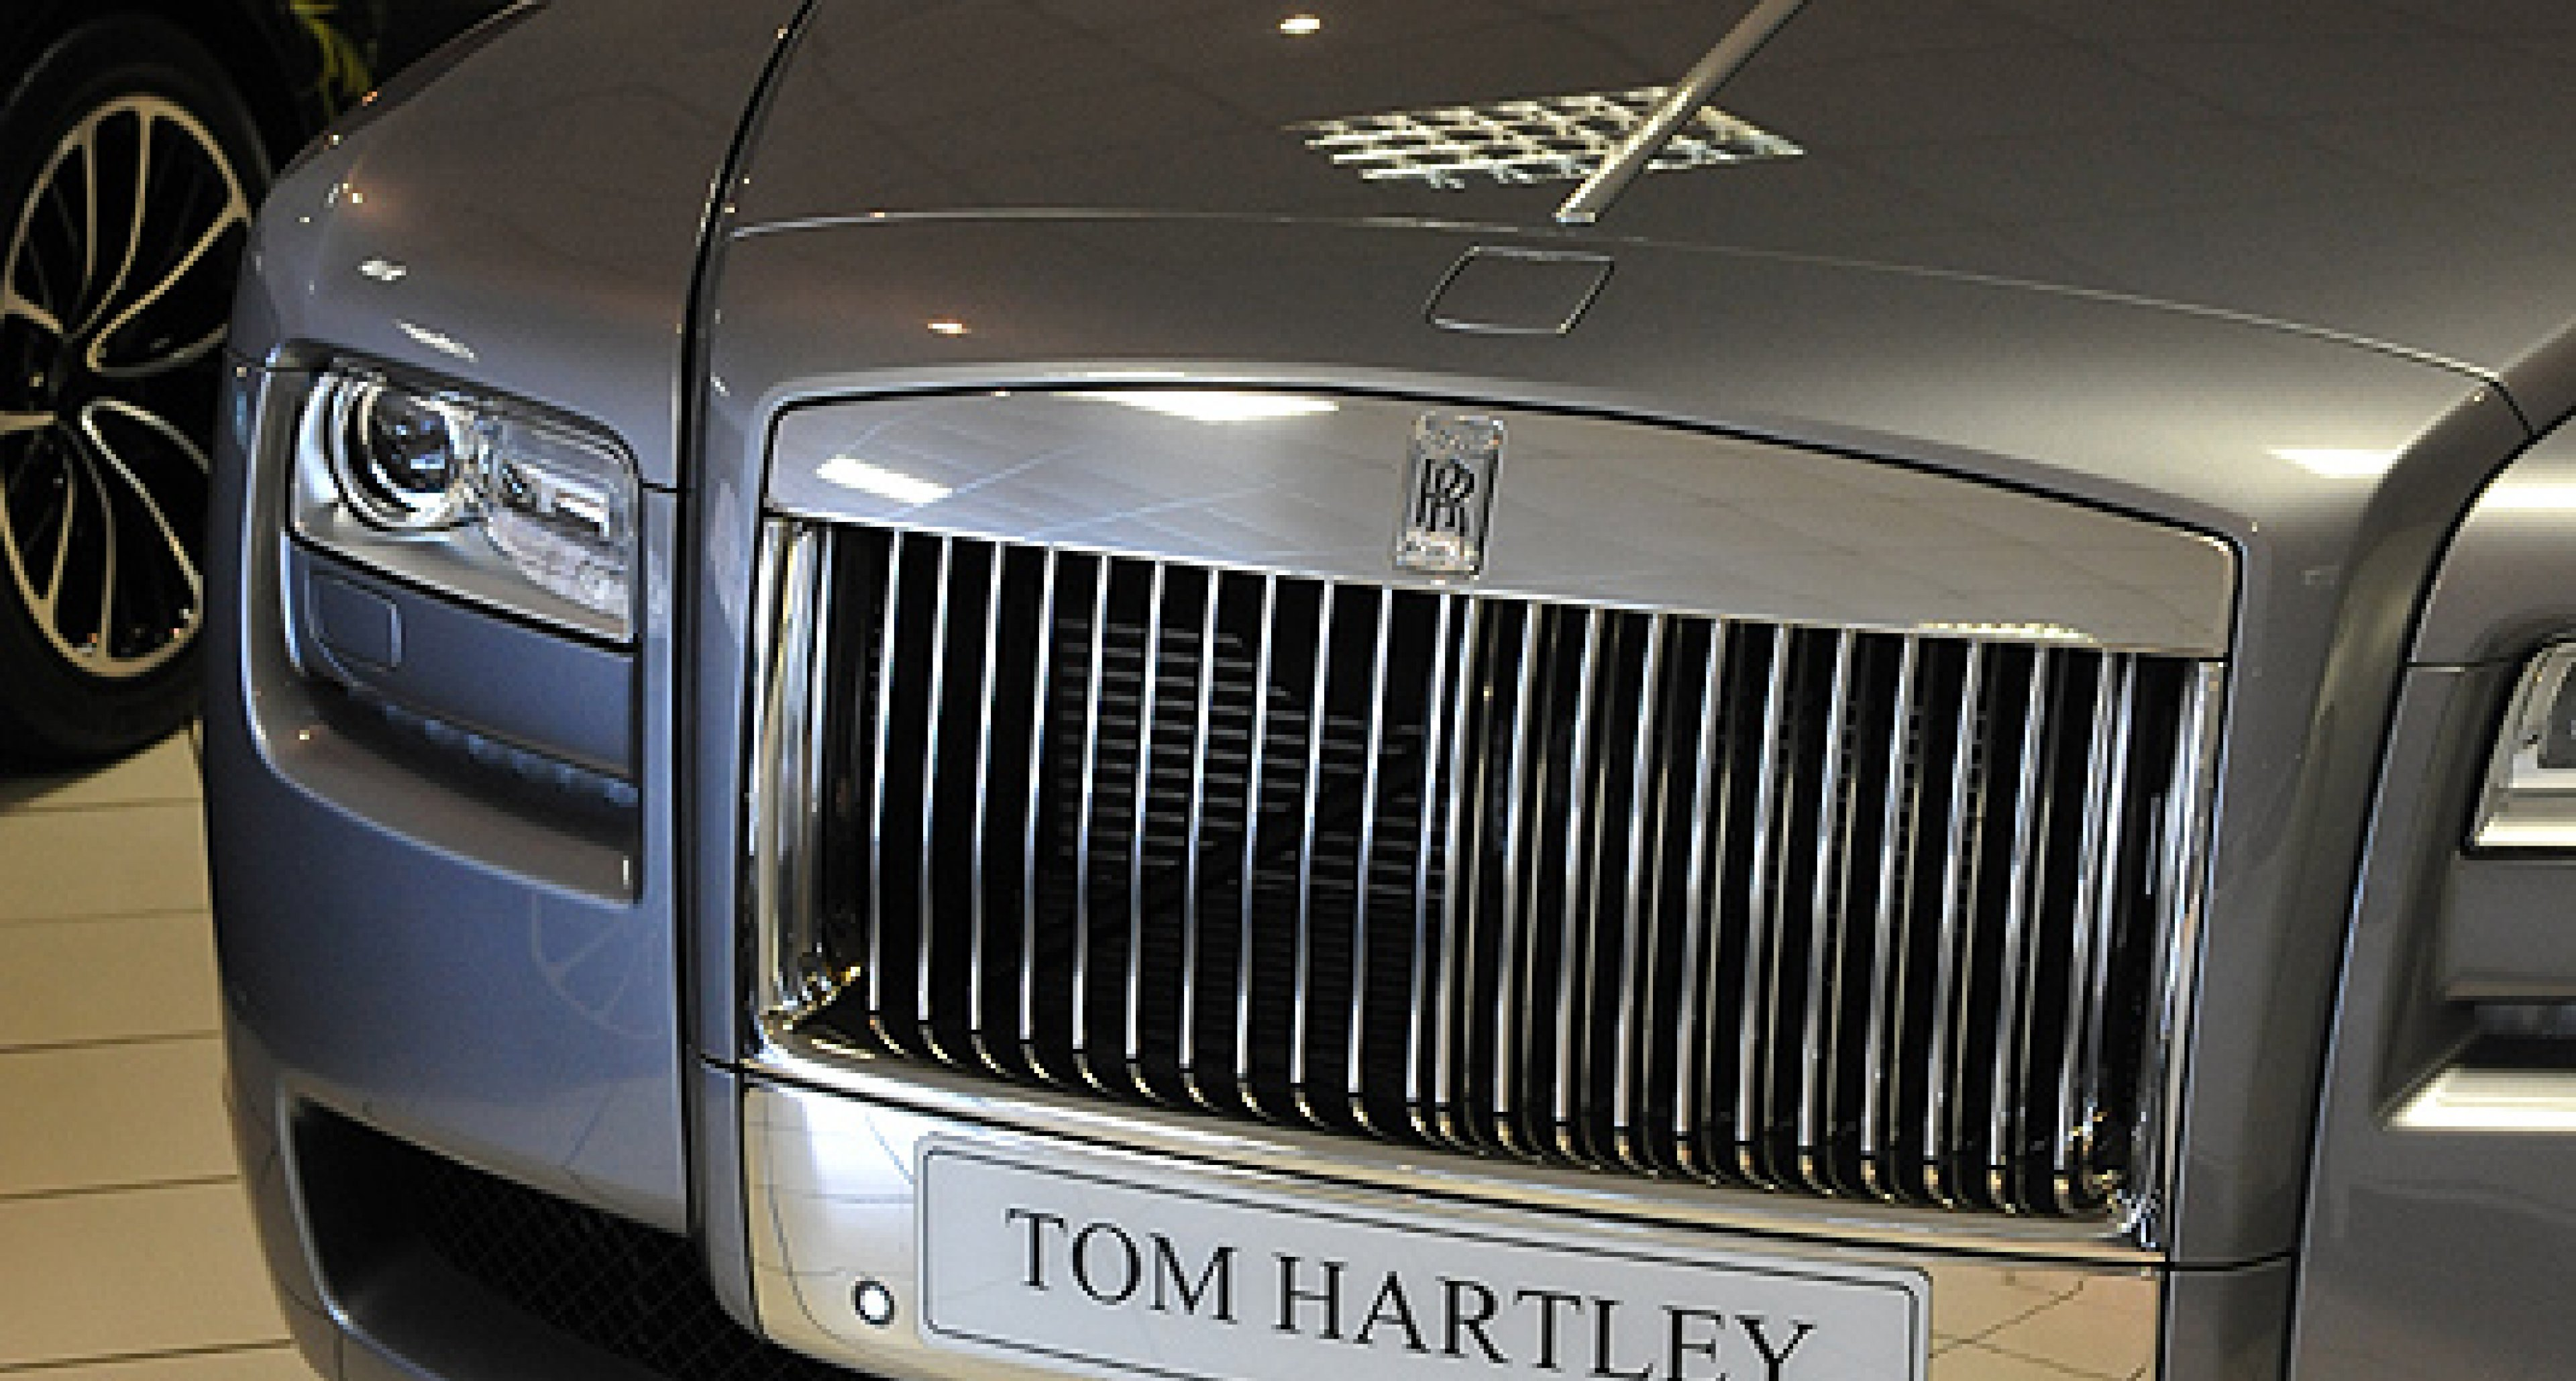 Tom Hartley: A family affair